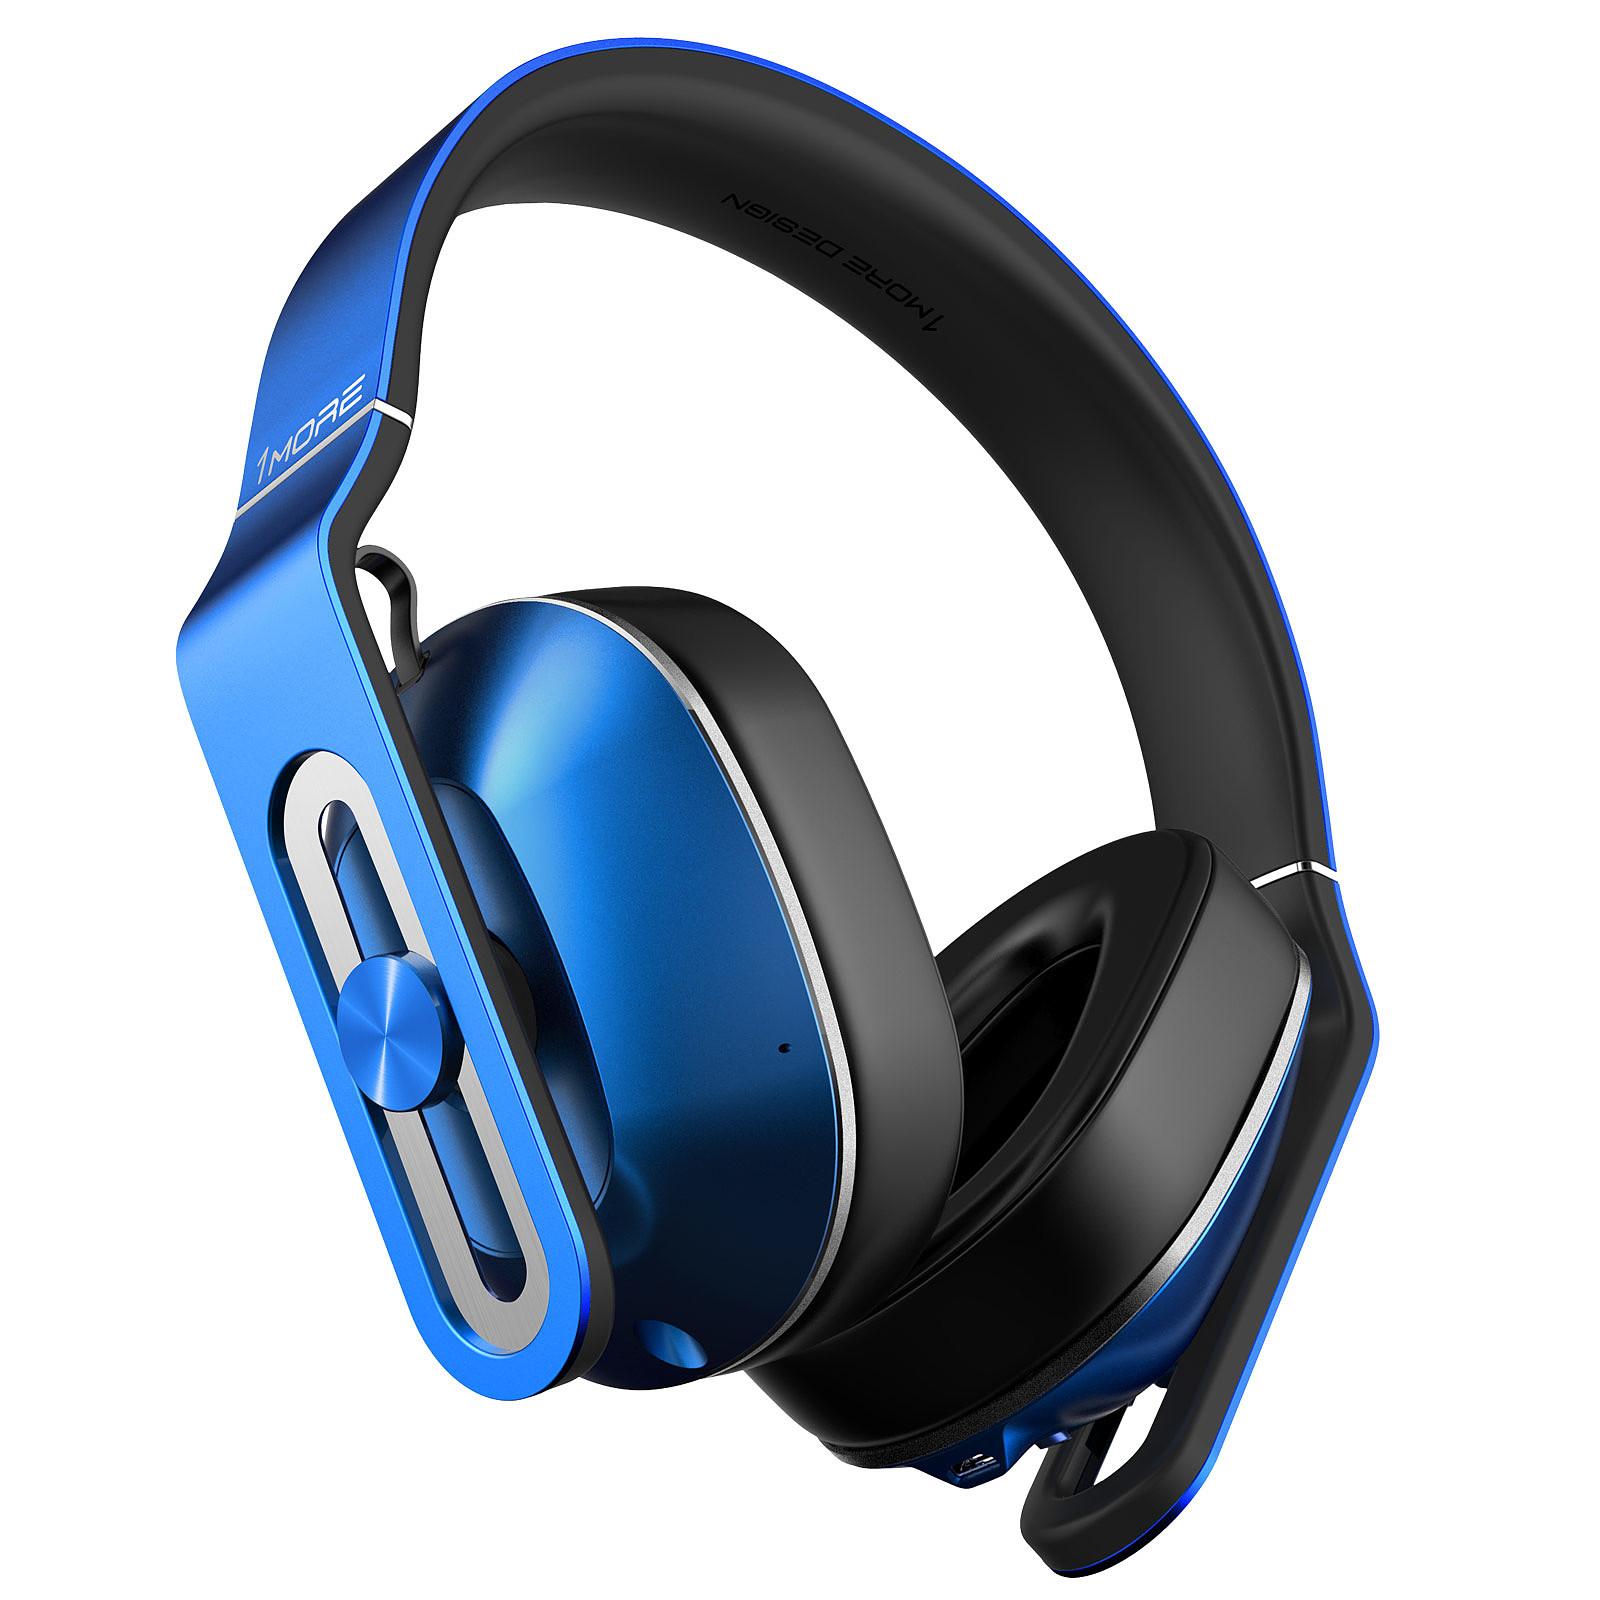 1MORE MK802 Bleu